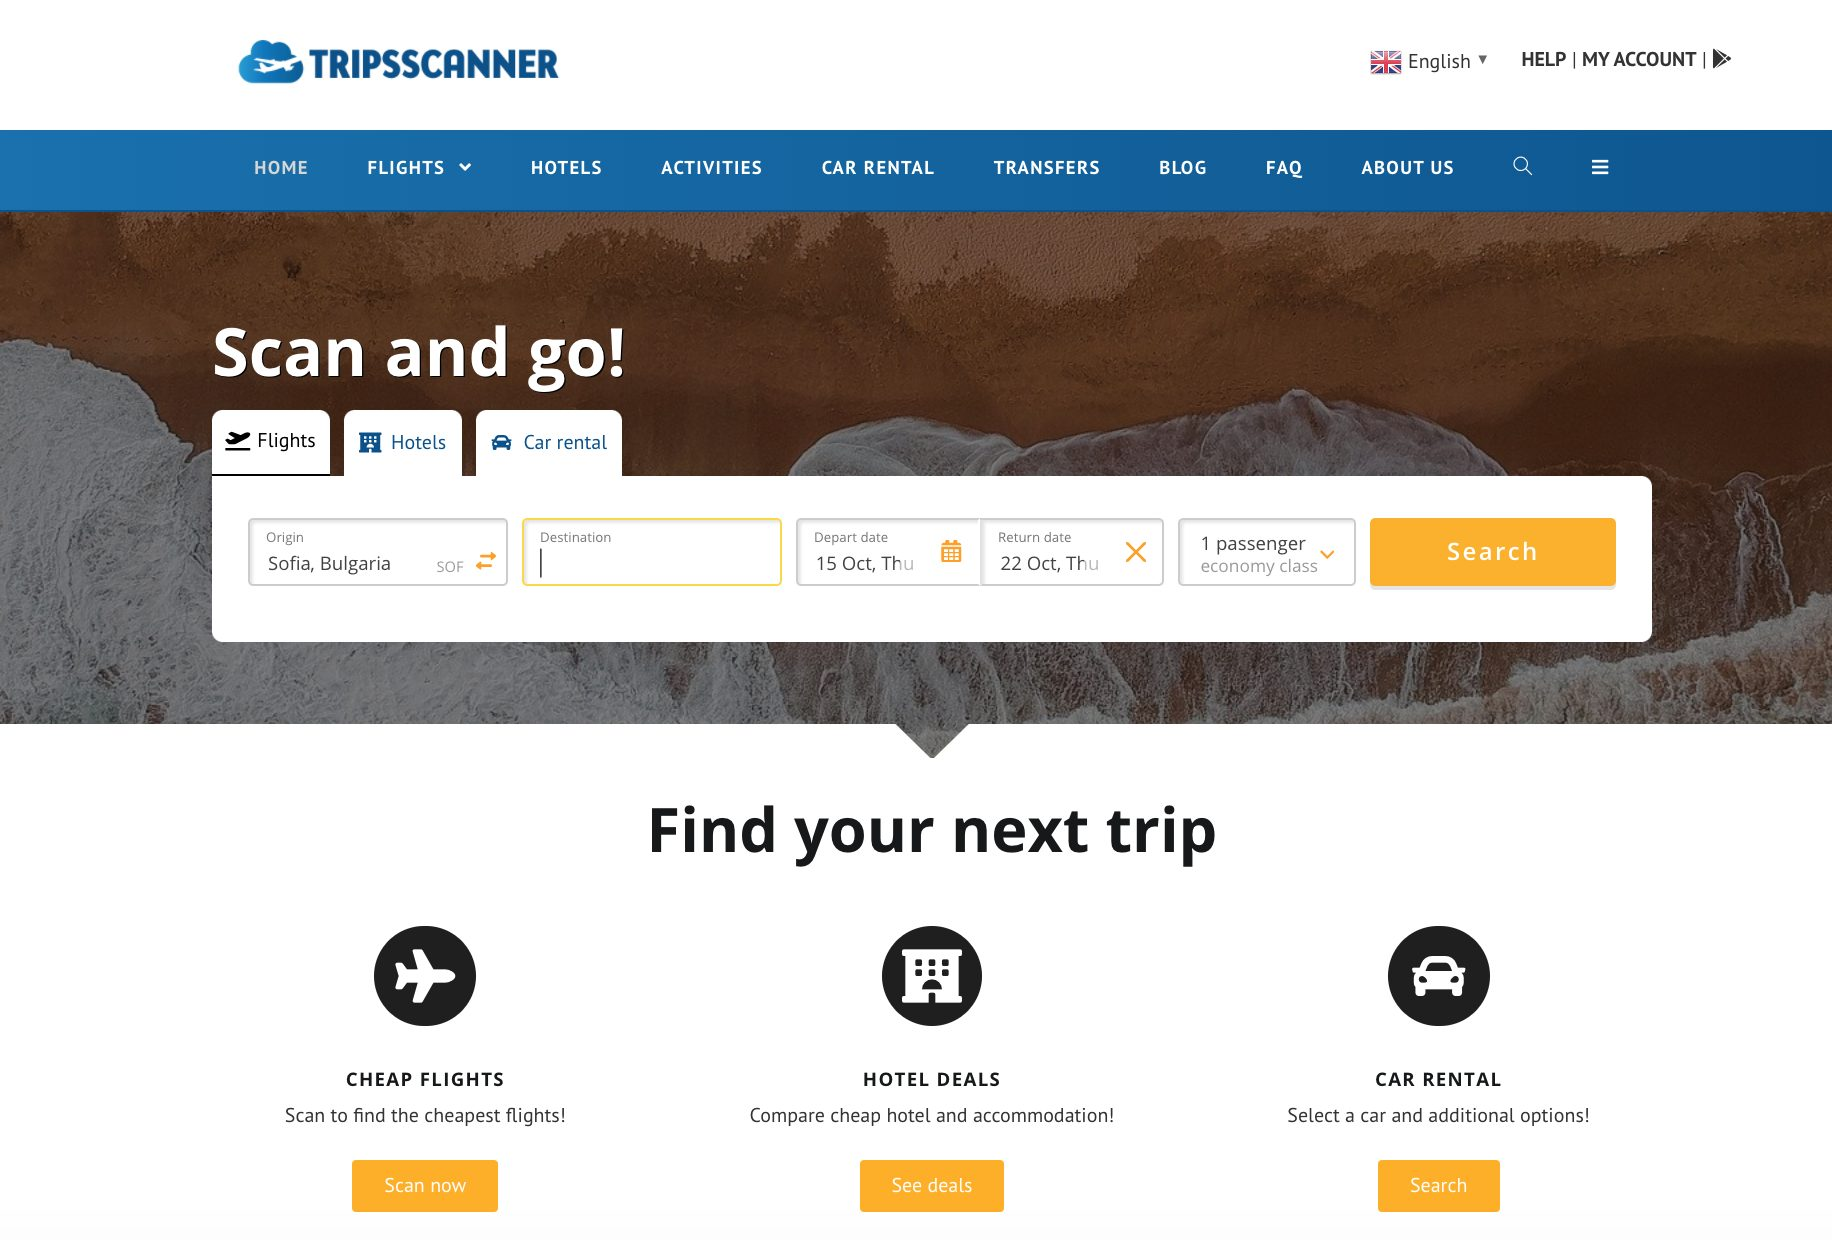 Tripsscanner